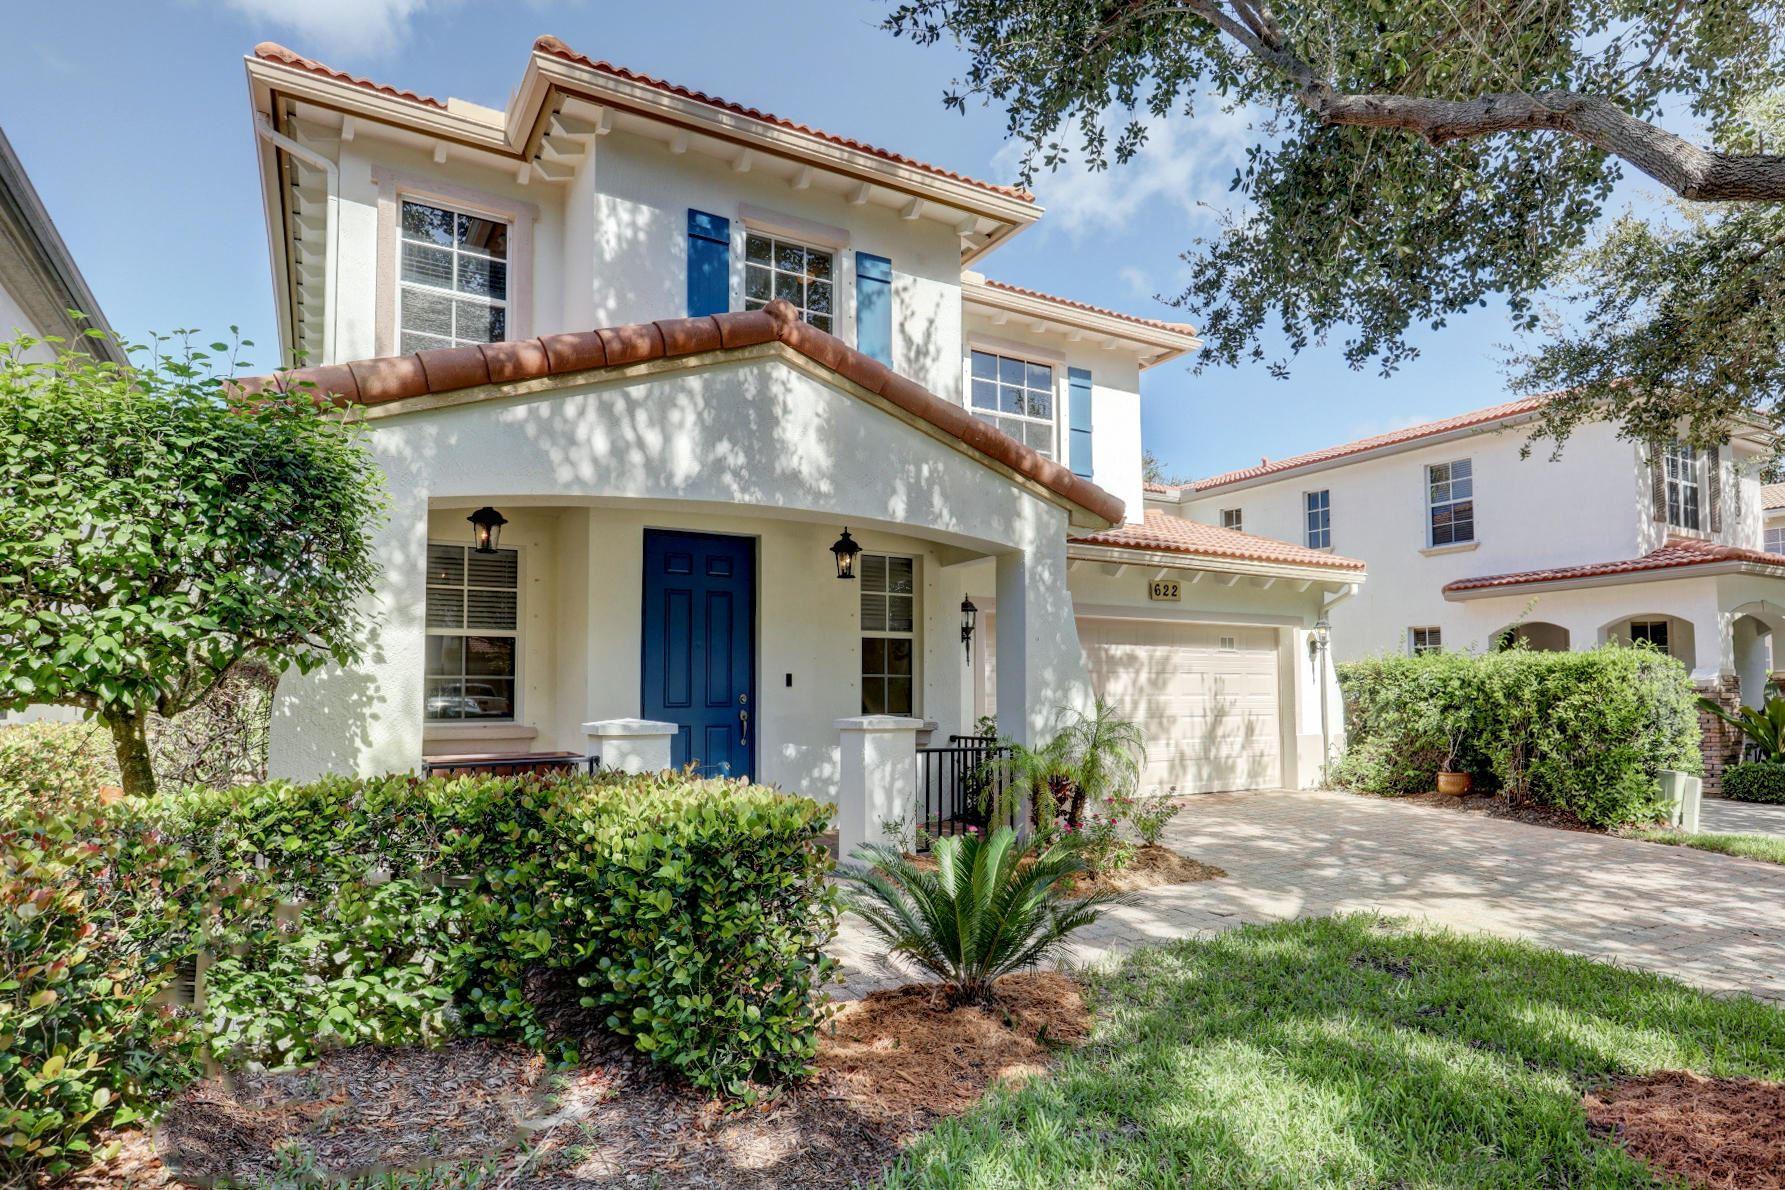 Photo of 622 Castle Drive, Palm Beach Gardens, FL 33410 (MLS # RX-10643608)